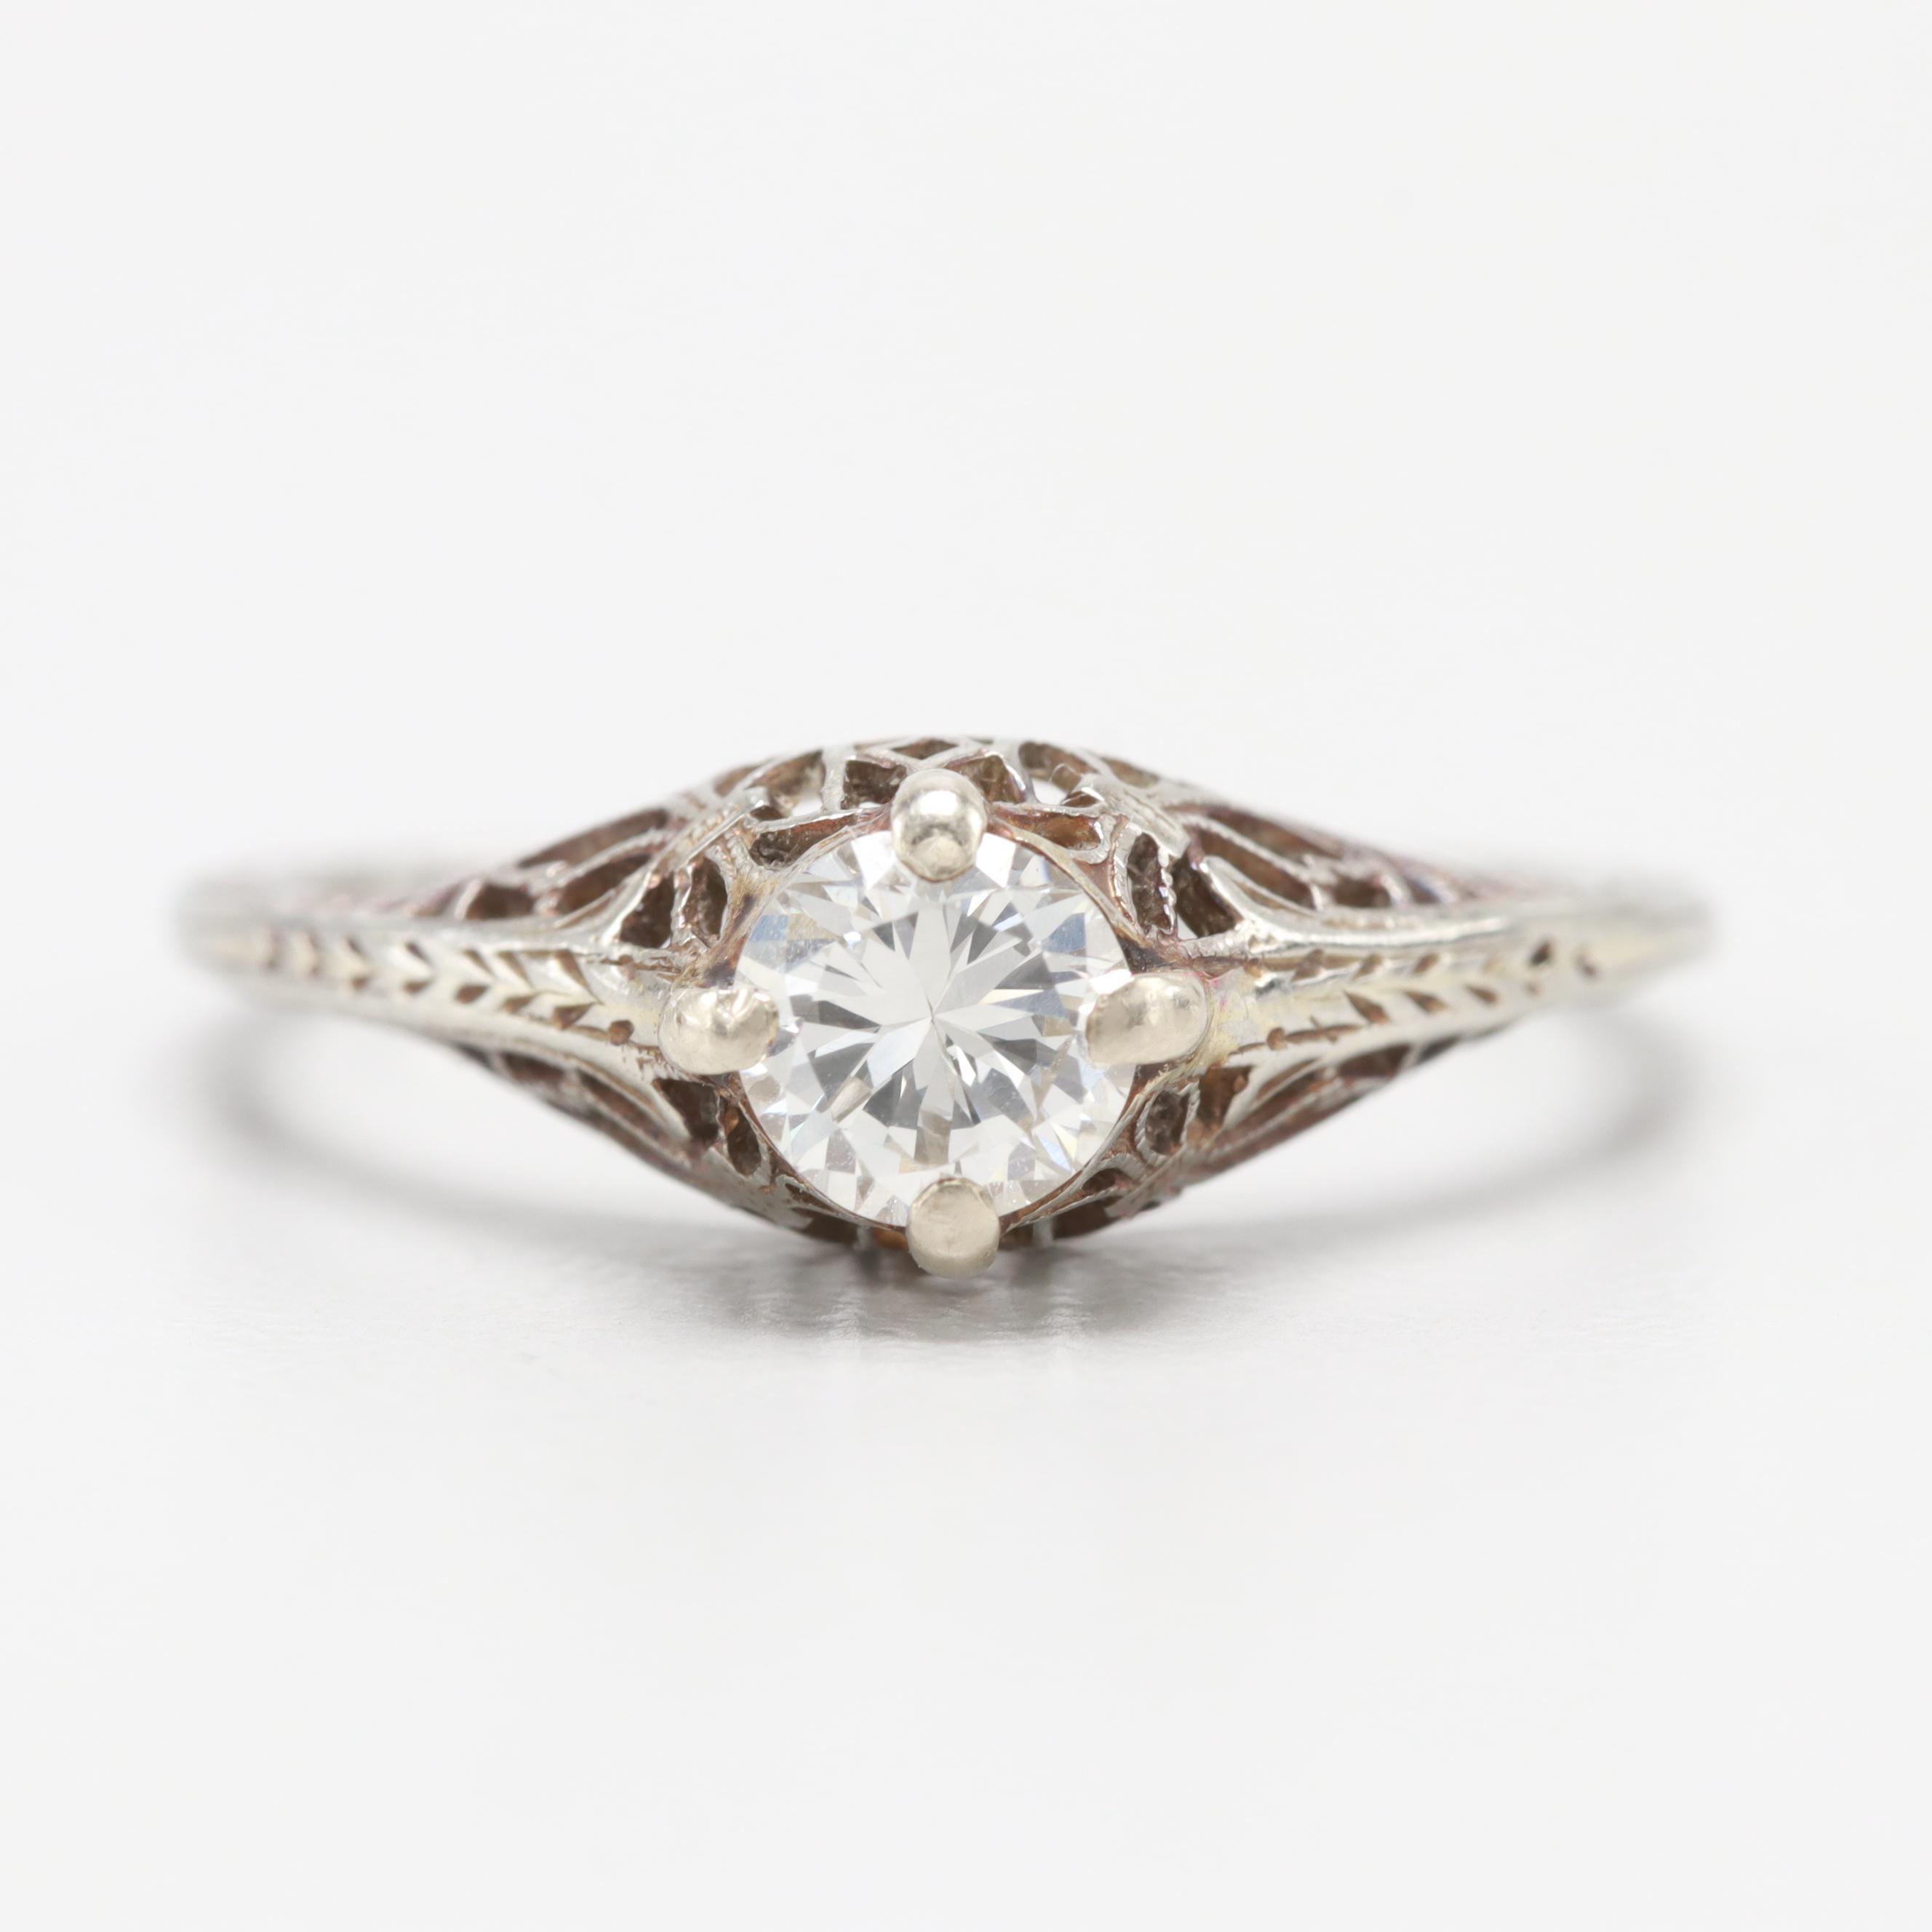 Art Deco 18K White Gold 0.39 CT Diamond Ring